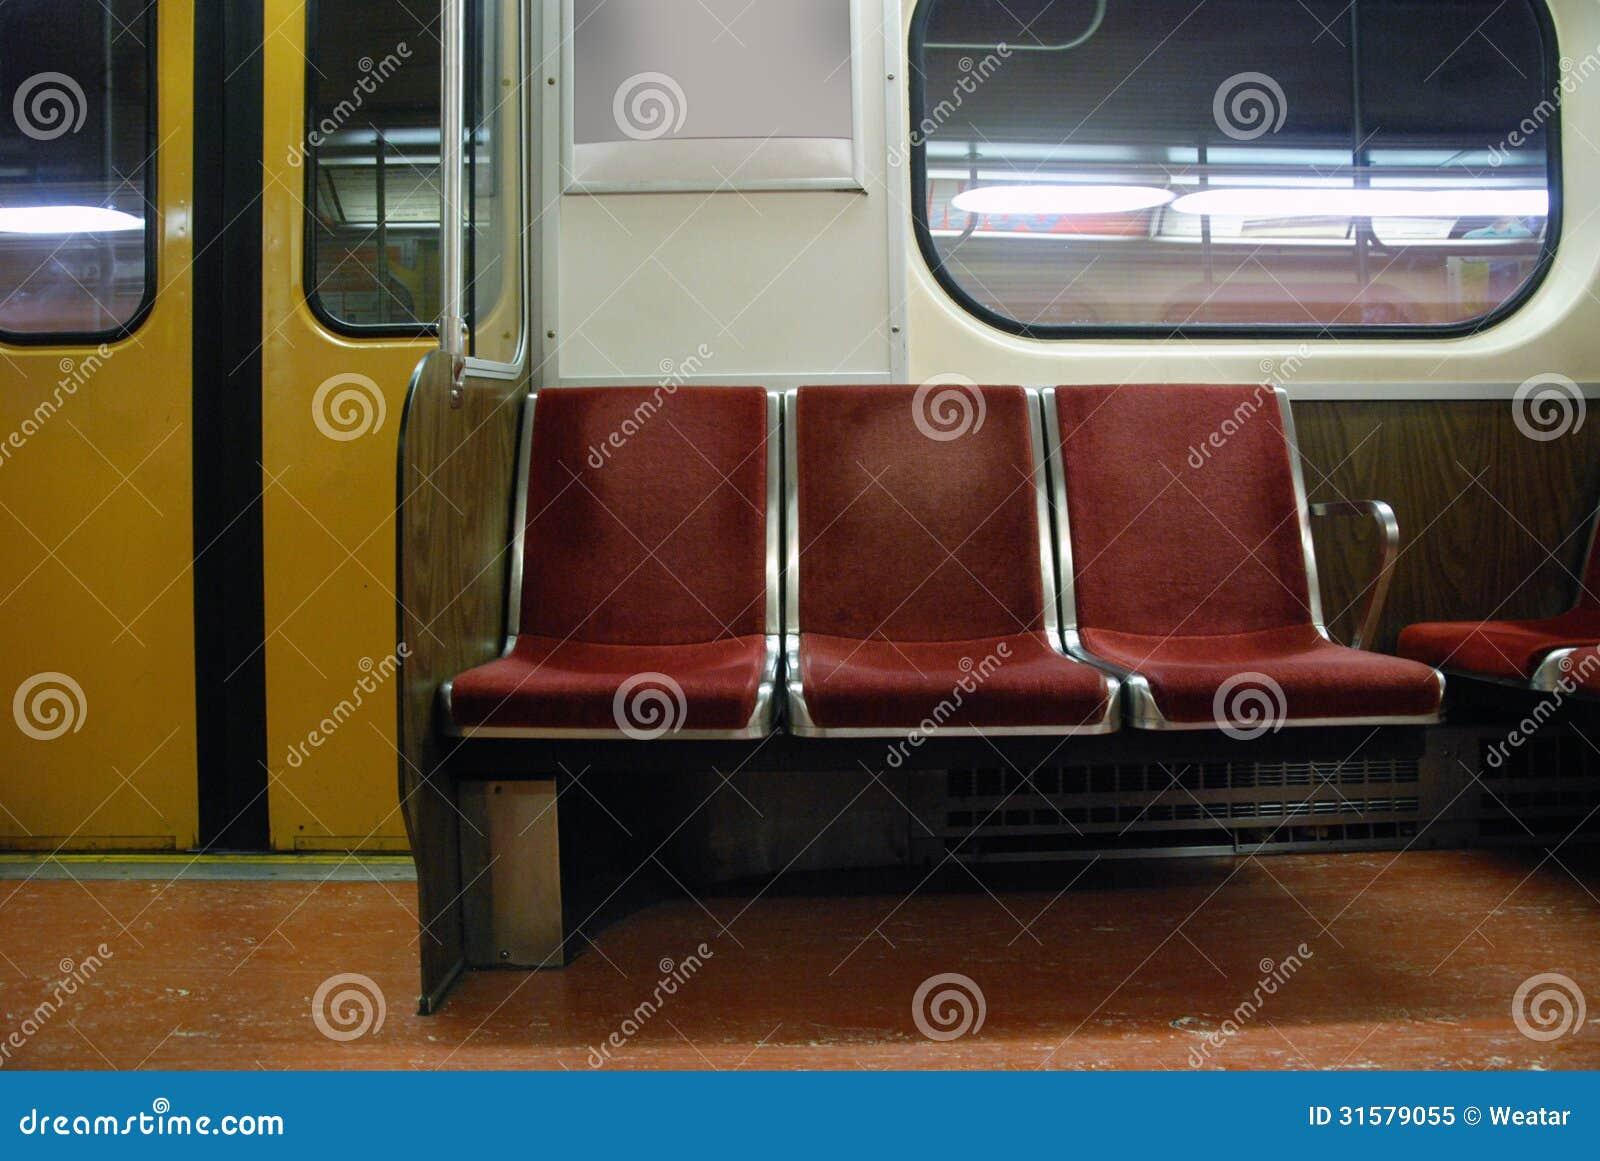 empty subway seats royalty free stock photo image 31579055. Black Bedroom Furniture Sets. Home Design Ideas